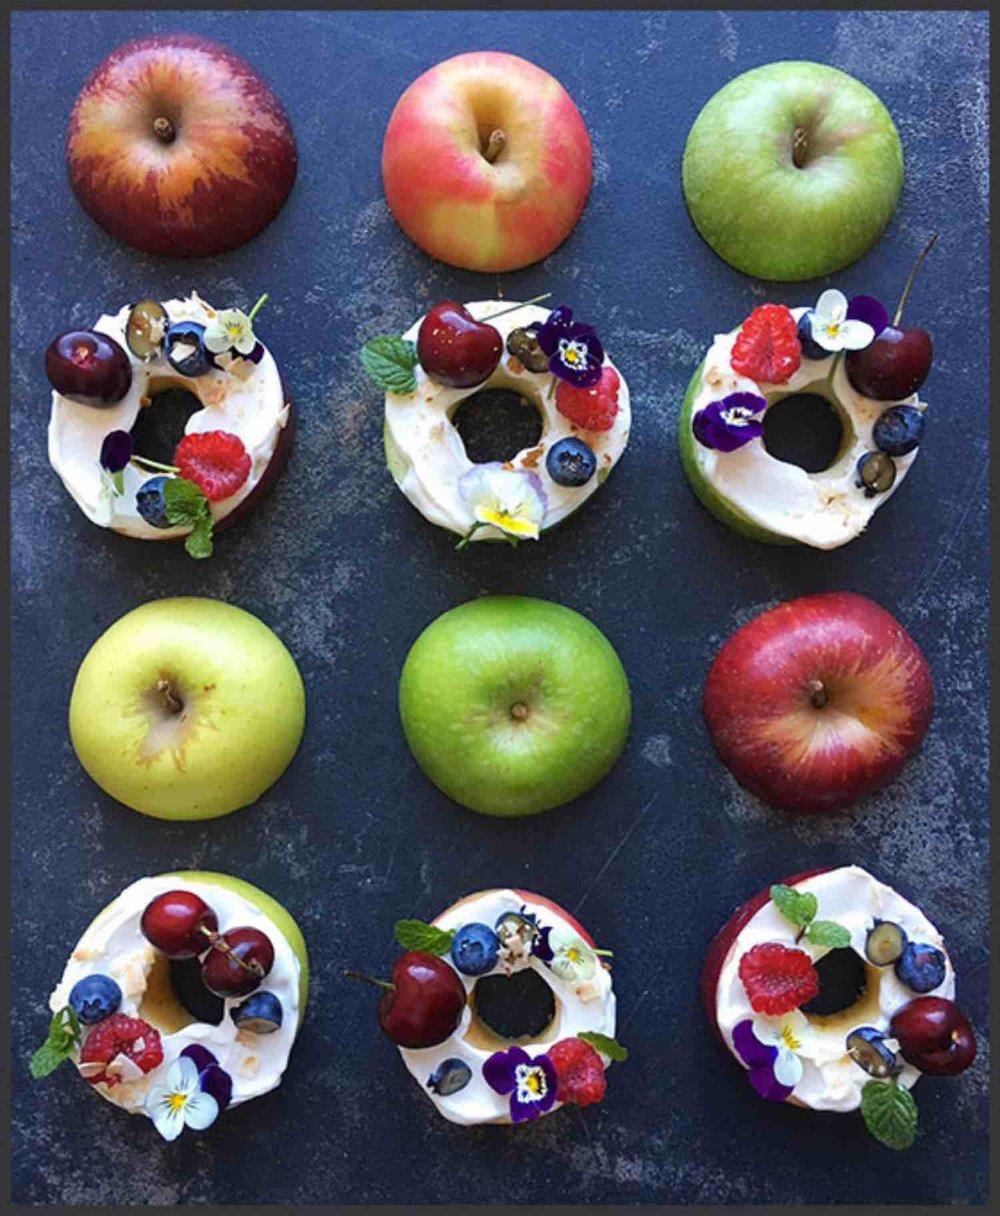 Apple donuts resize.jpg